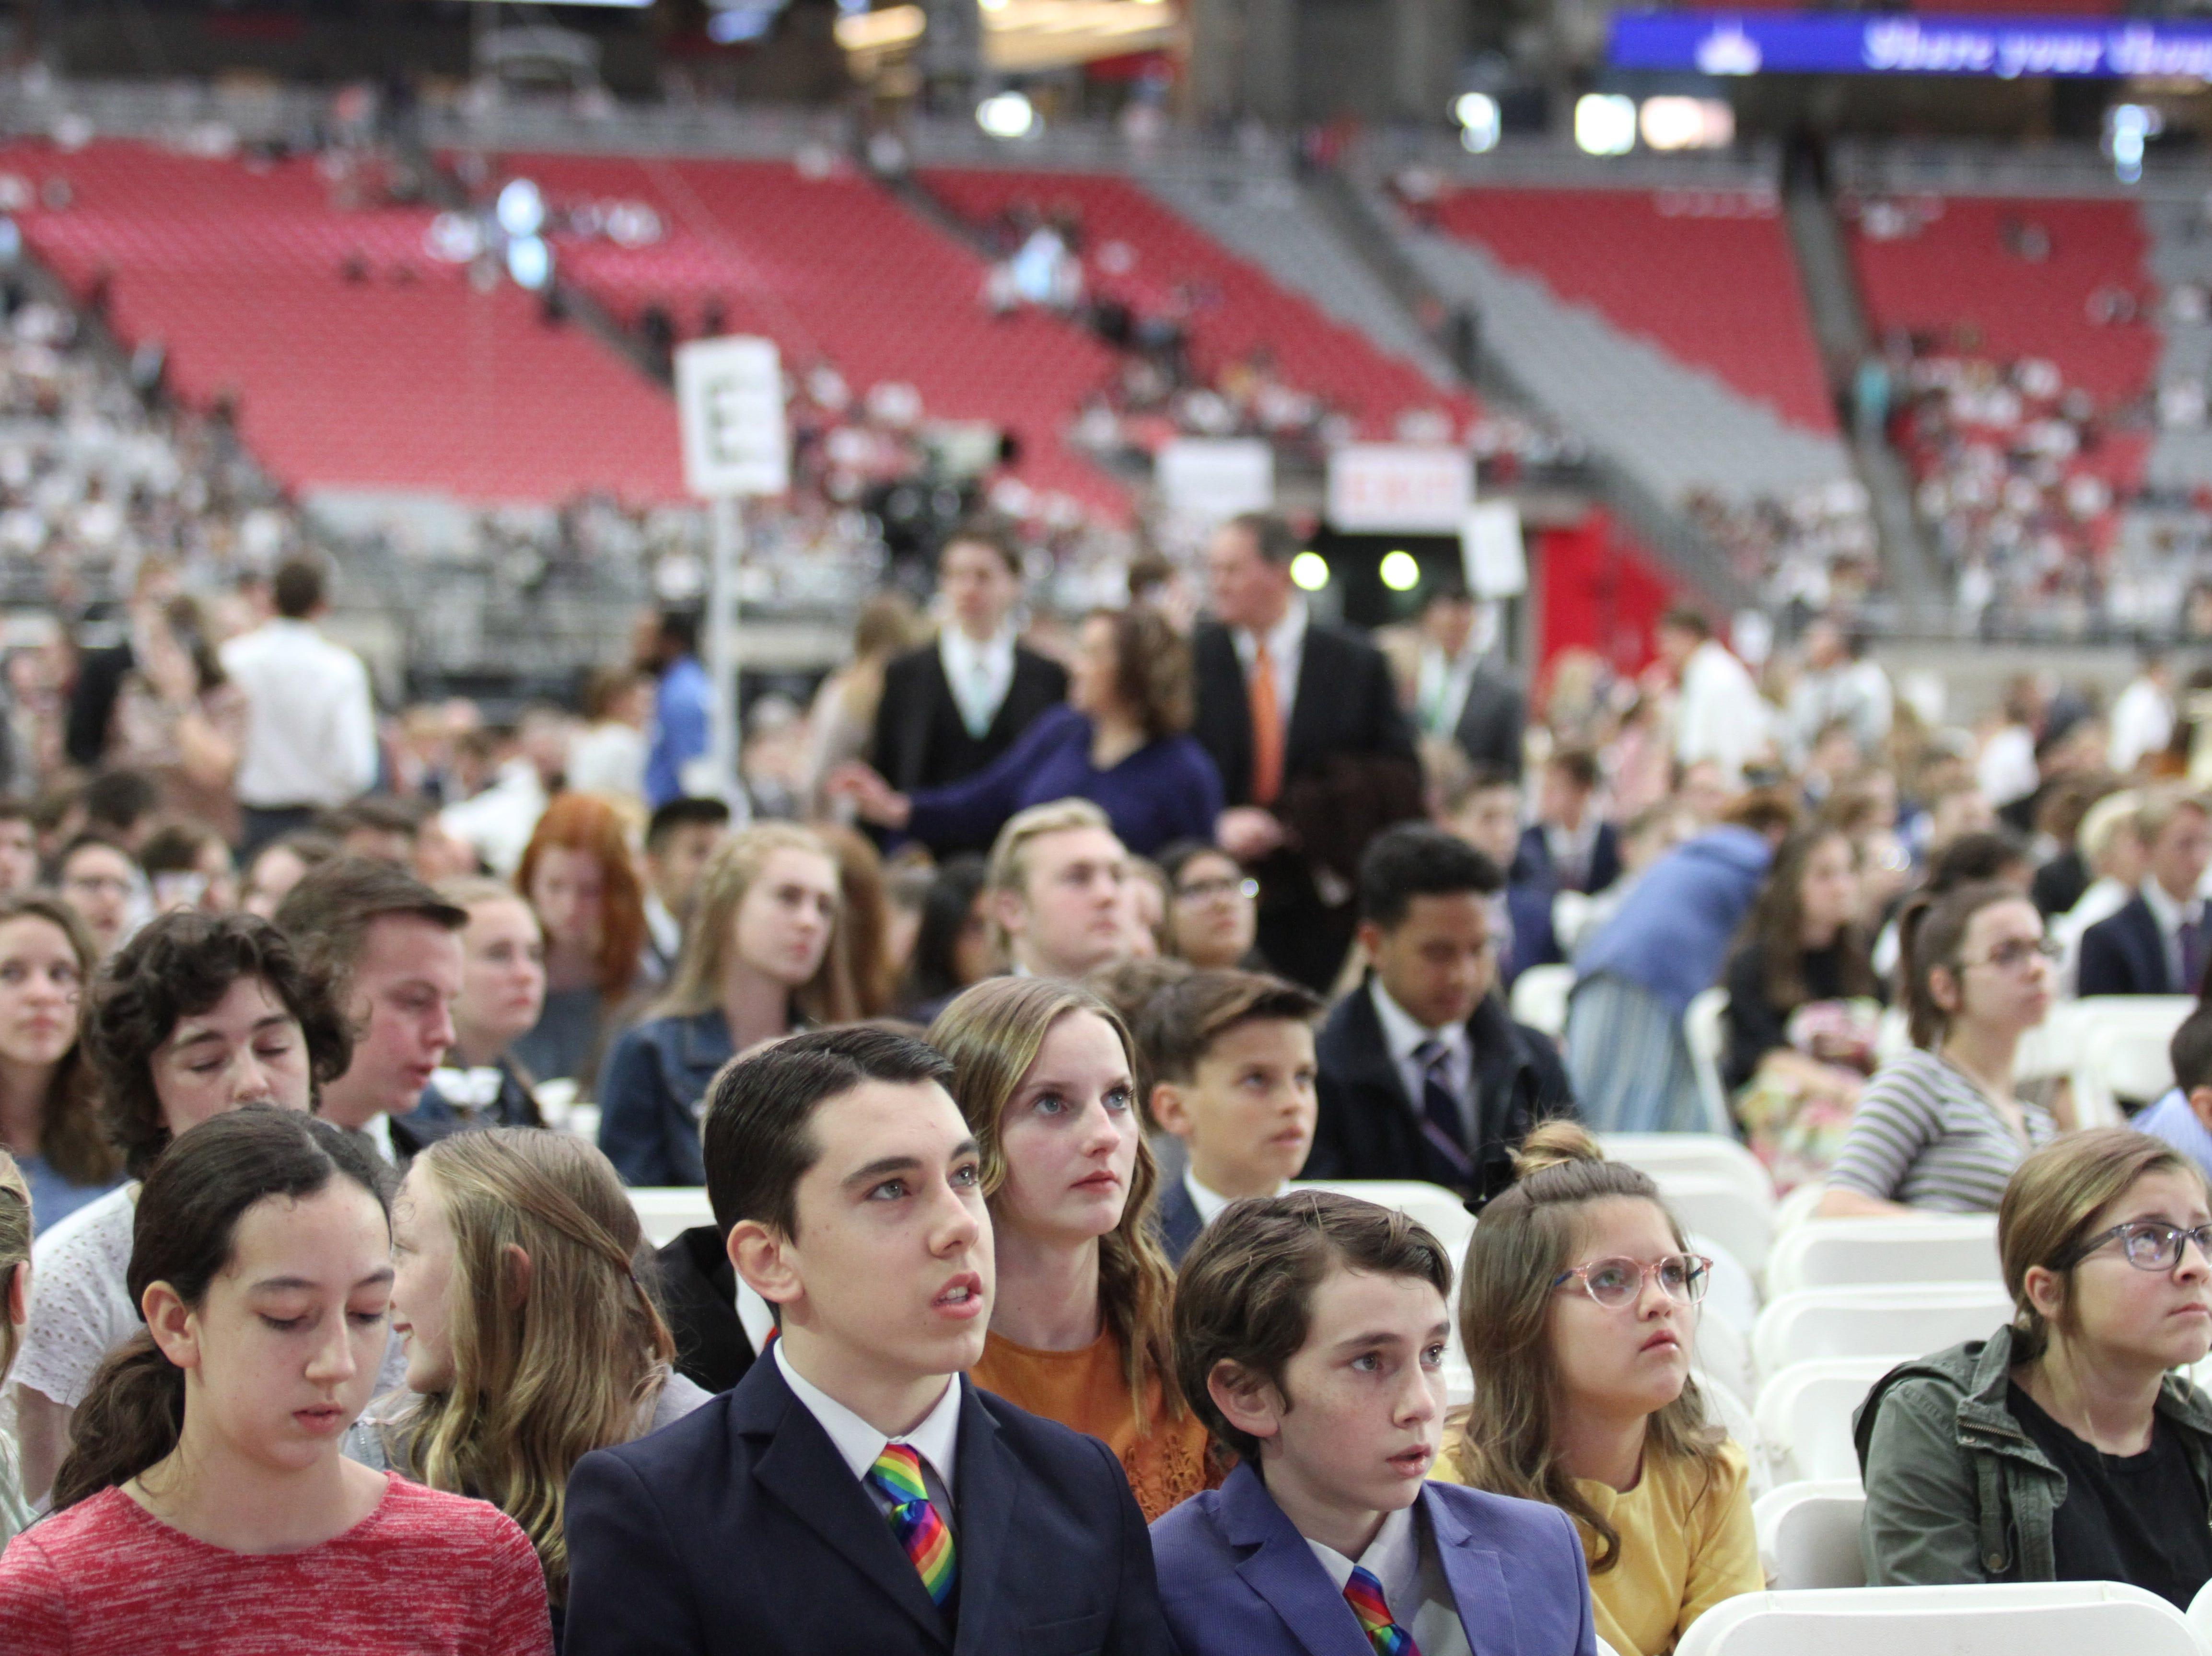 Thousands gather to hear President M. Nelson speak at State Farm Stadium in Glendale, Arizona, Feb. 10, 2019.